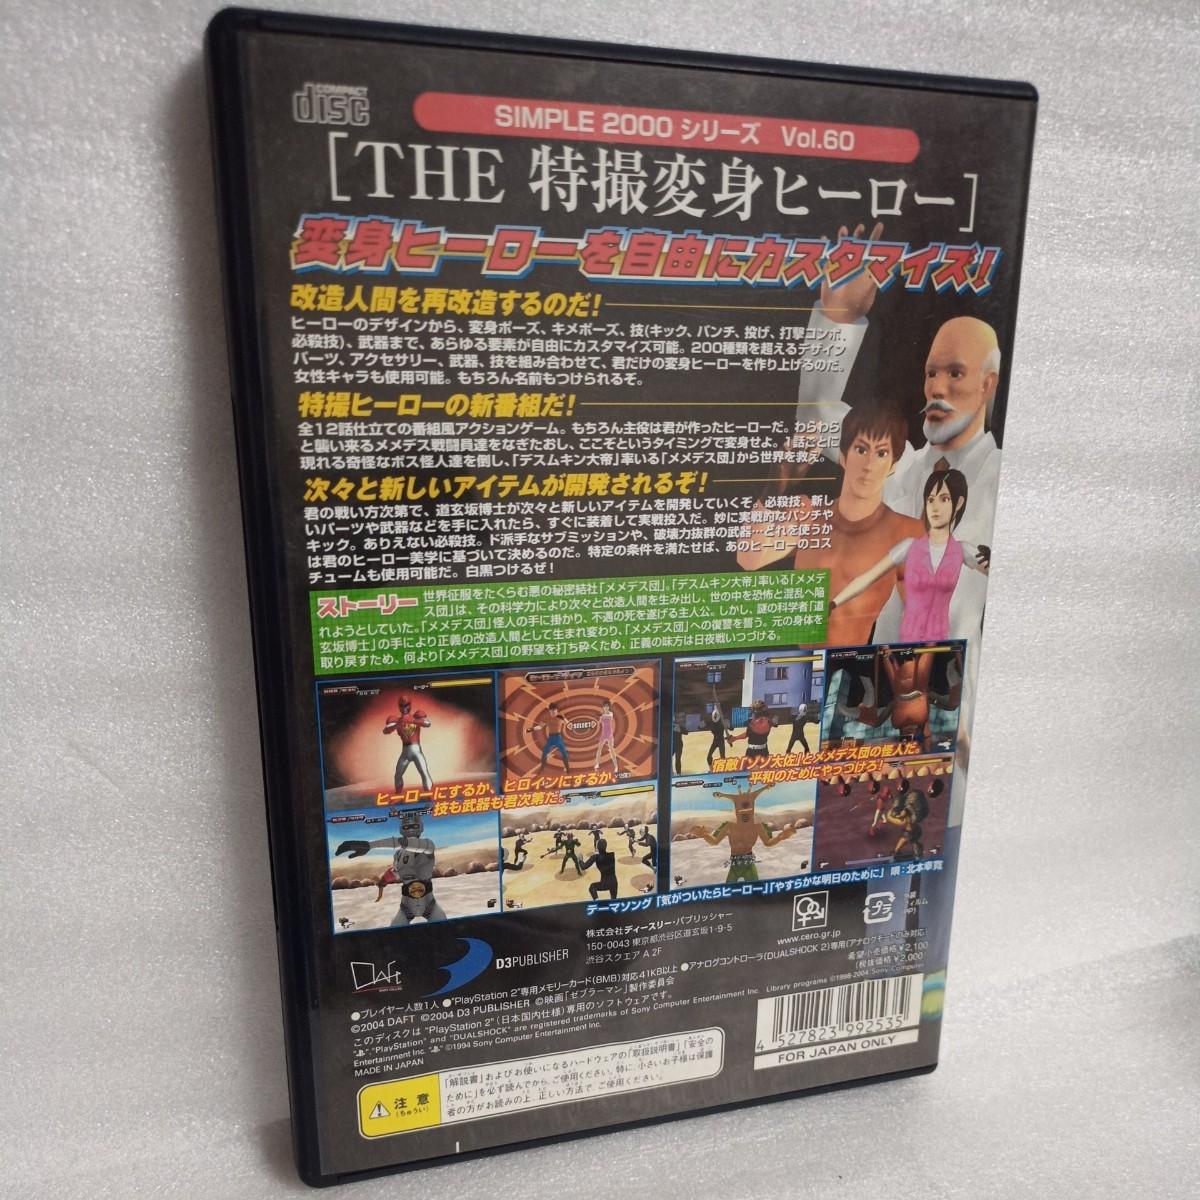 THE 特撮変身ヒーロー SIMPLE2000シリーズ Vol.60 (PS2ソフト/D3パブリッシャー)